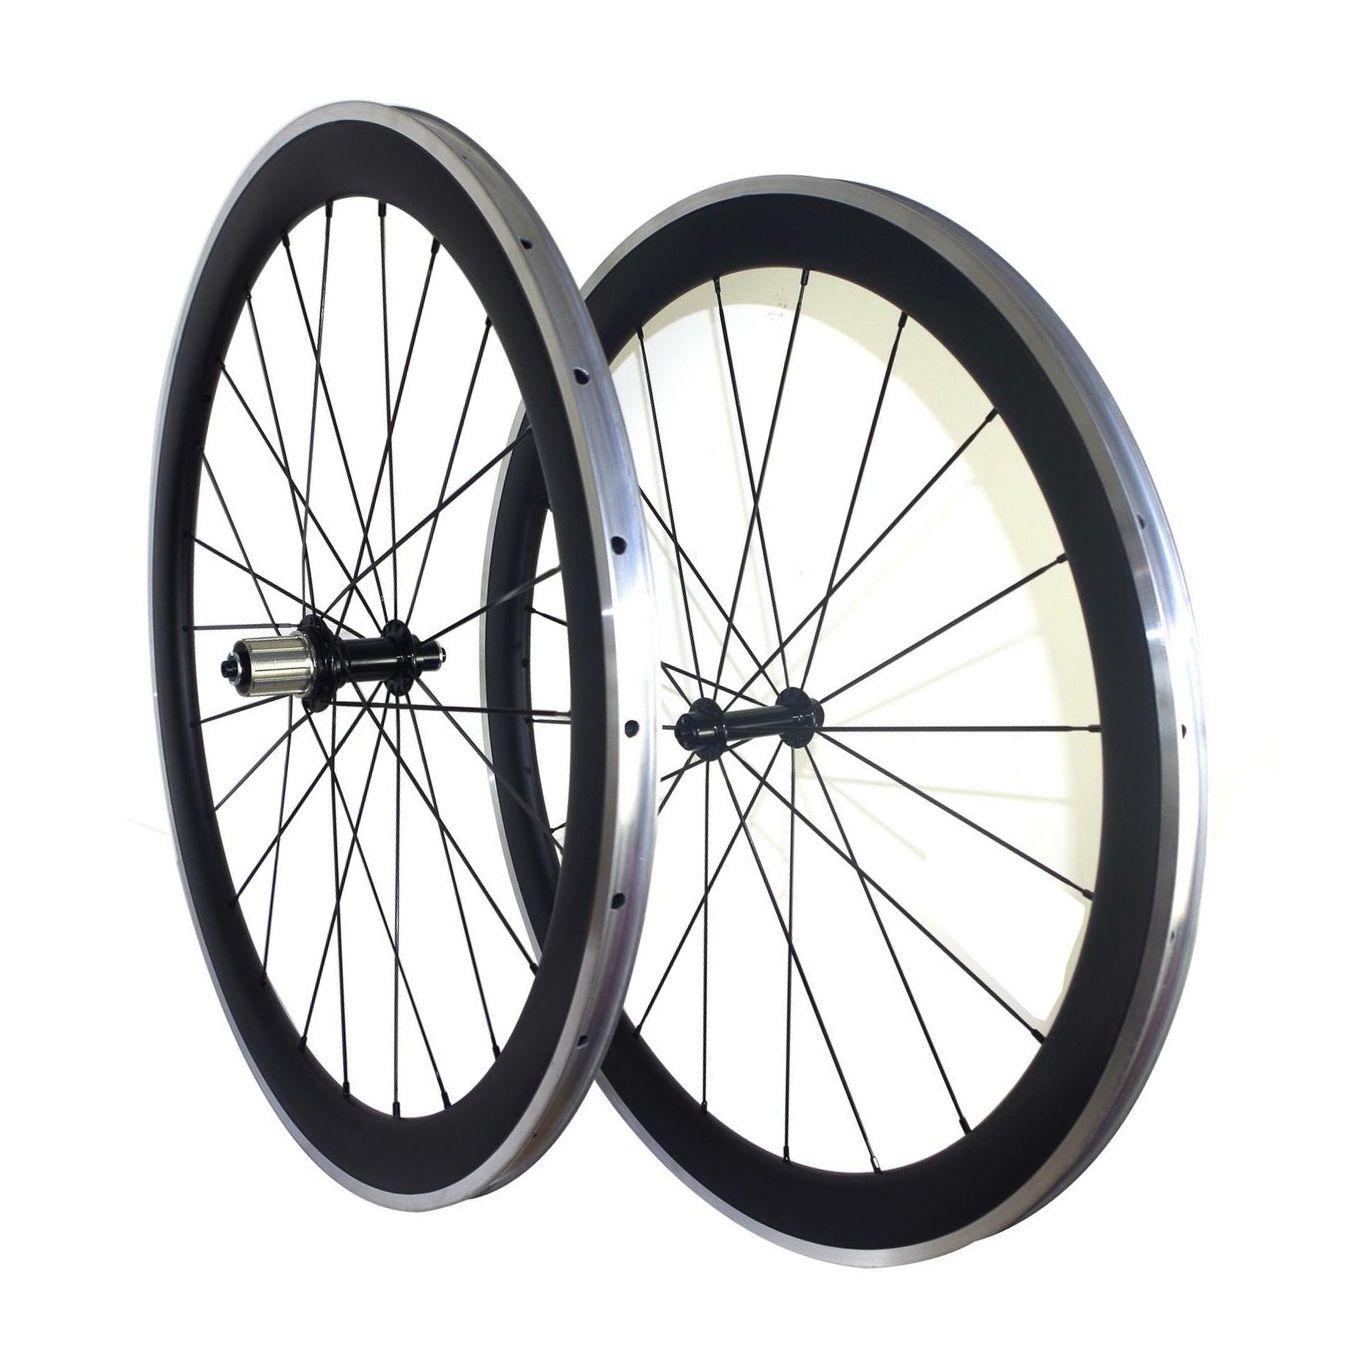 Carbon Bicycle Wheels 700C Road Bike Carbon+Aluminium Alloy Brake 38mm Depth*23mm Width Clincher Rim 3K/UD Glossy/Matte Surface